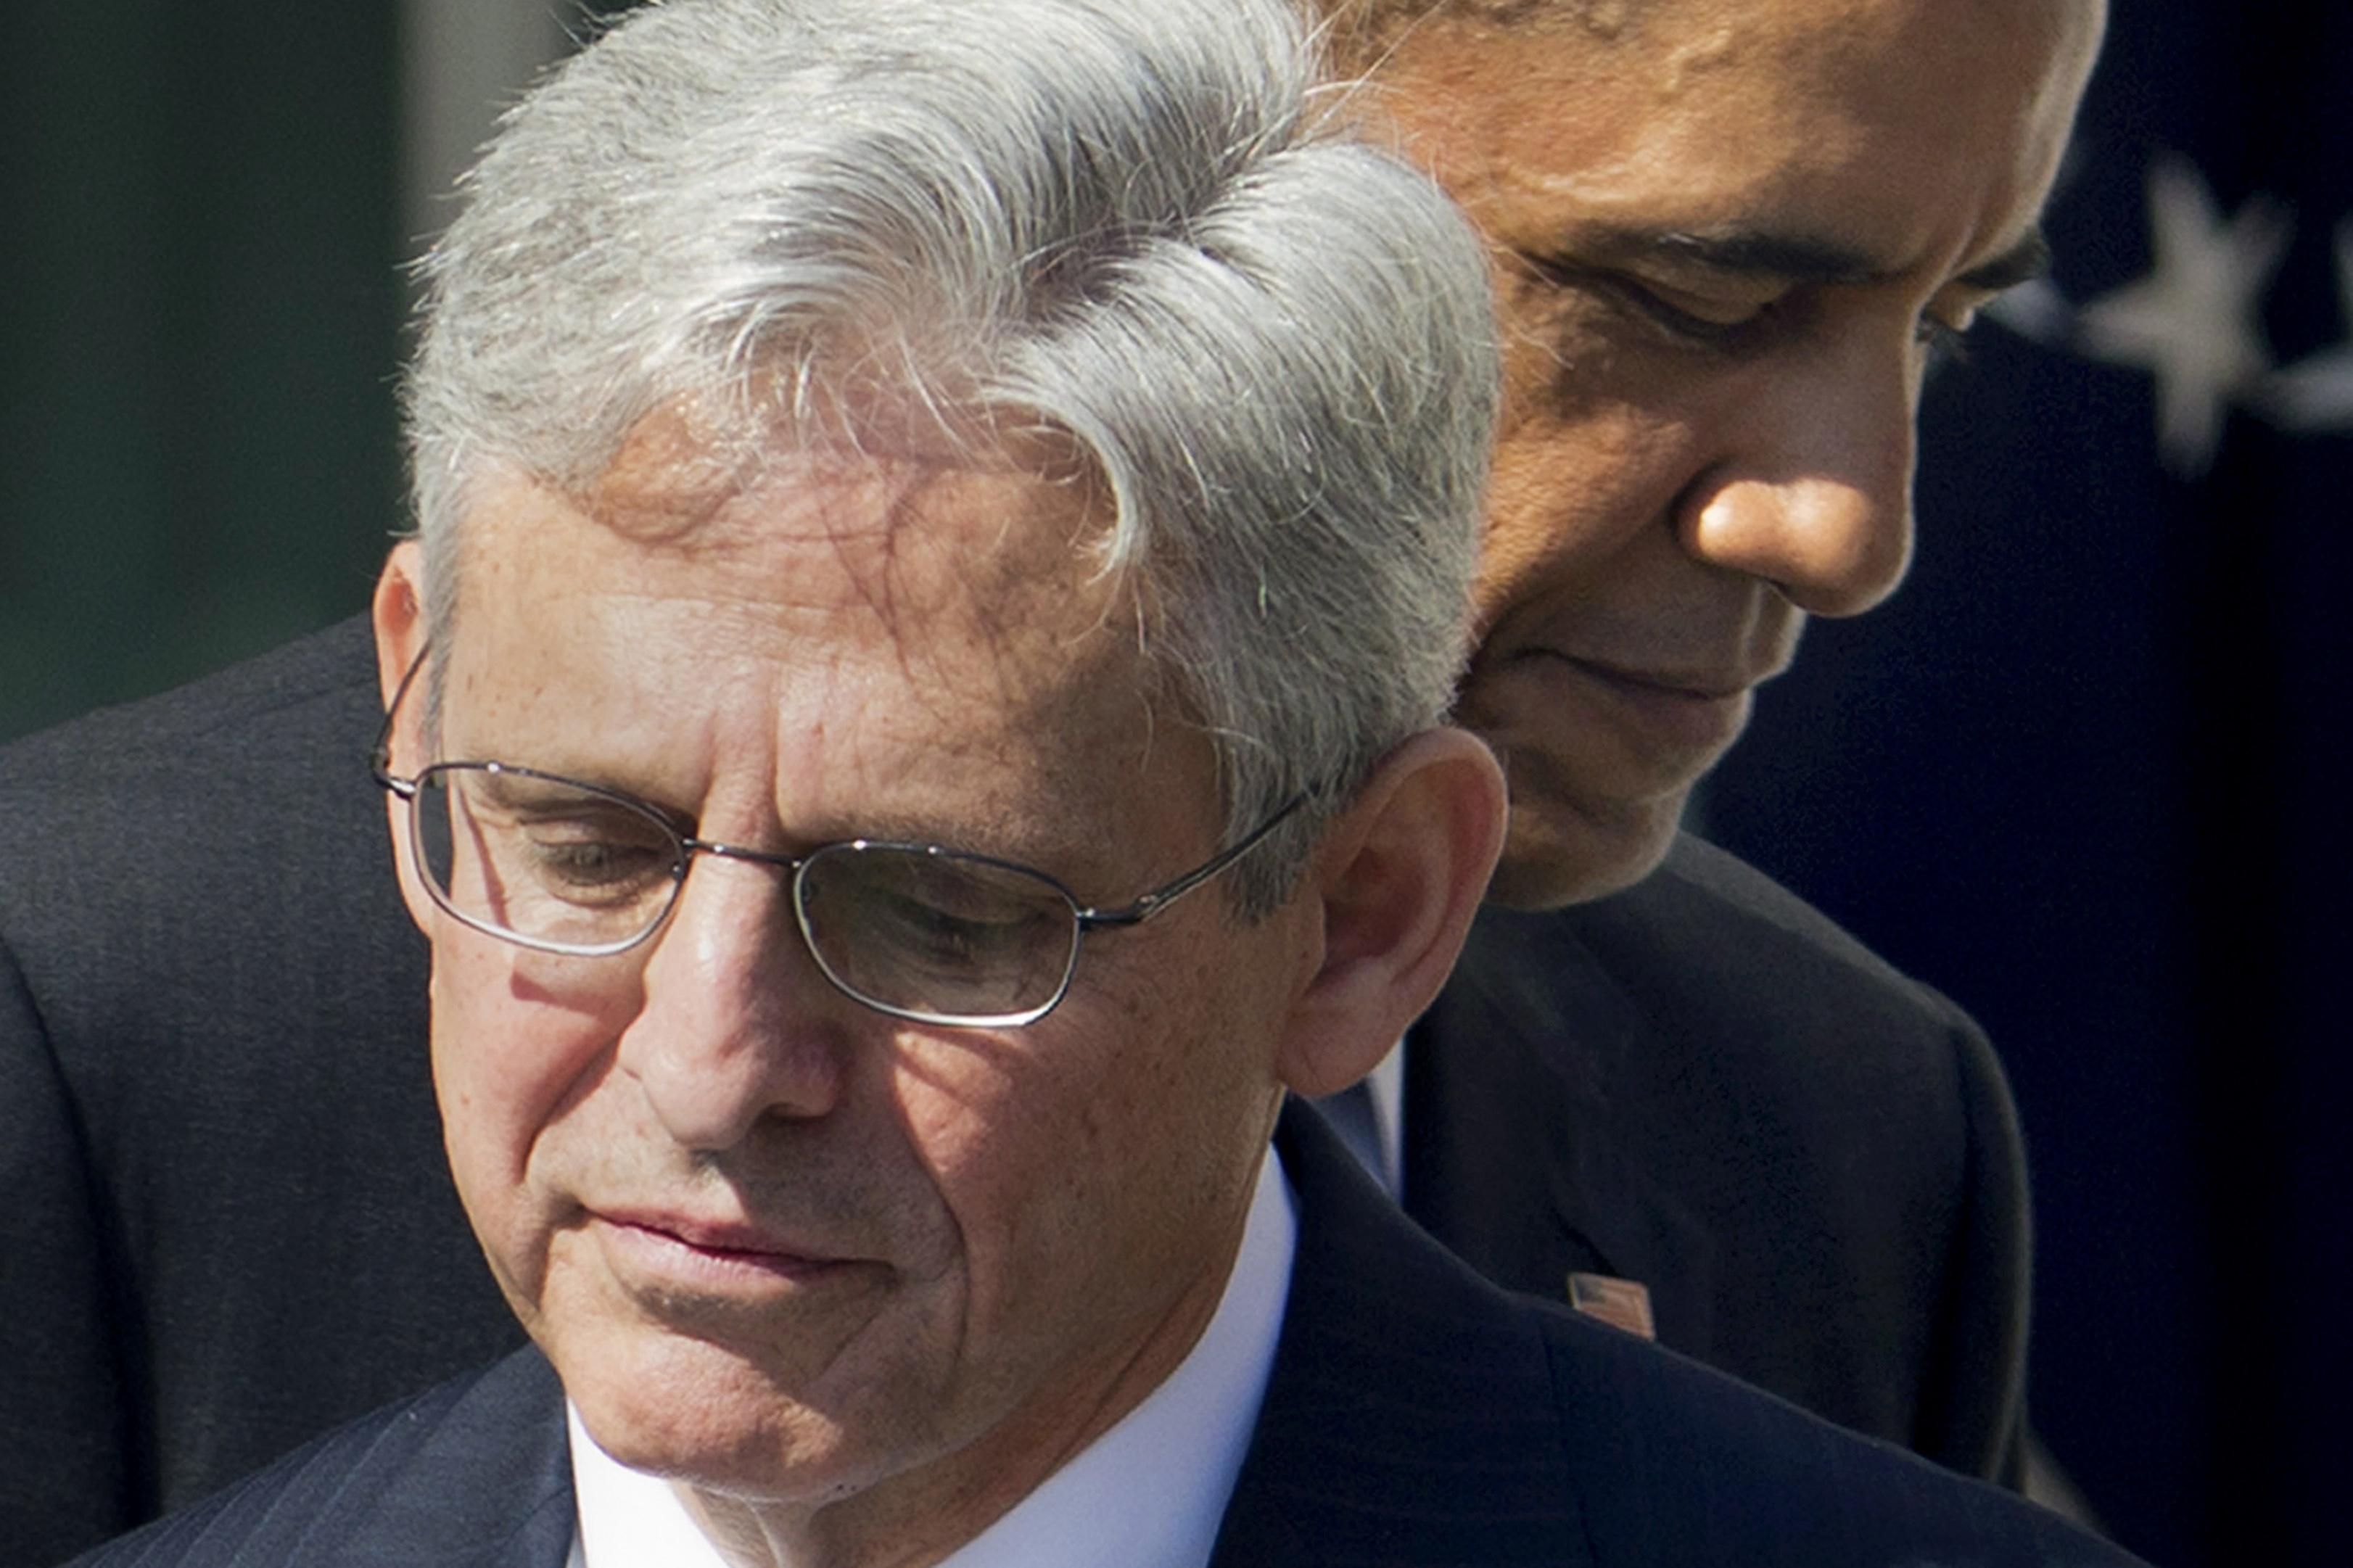 Obama Admin Waves White Flag On Trade Deal Merrick Garland Supreme